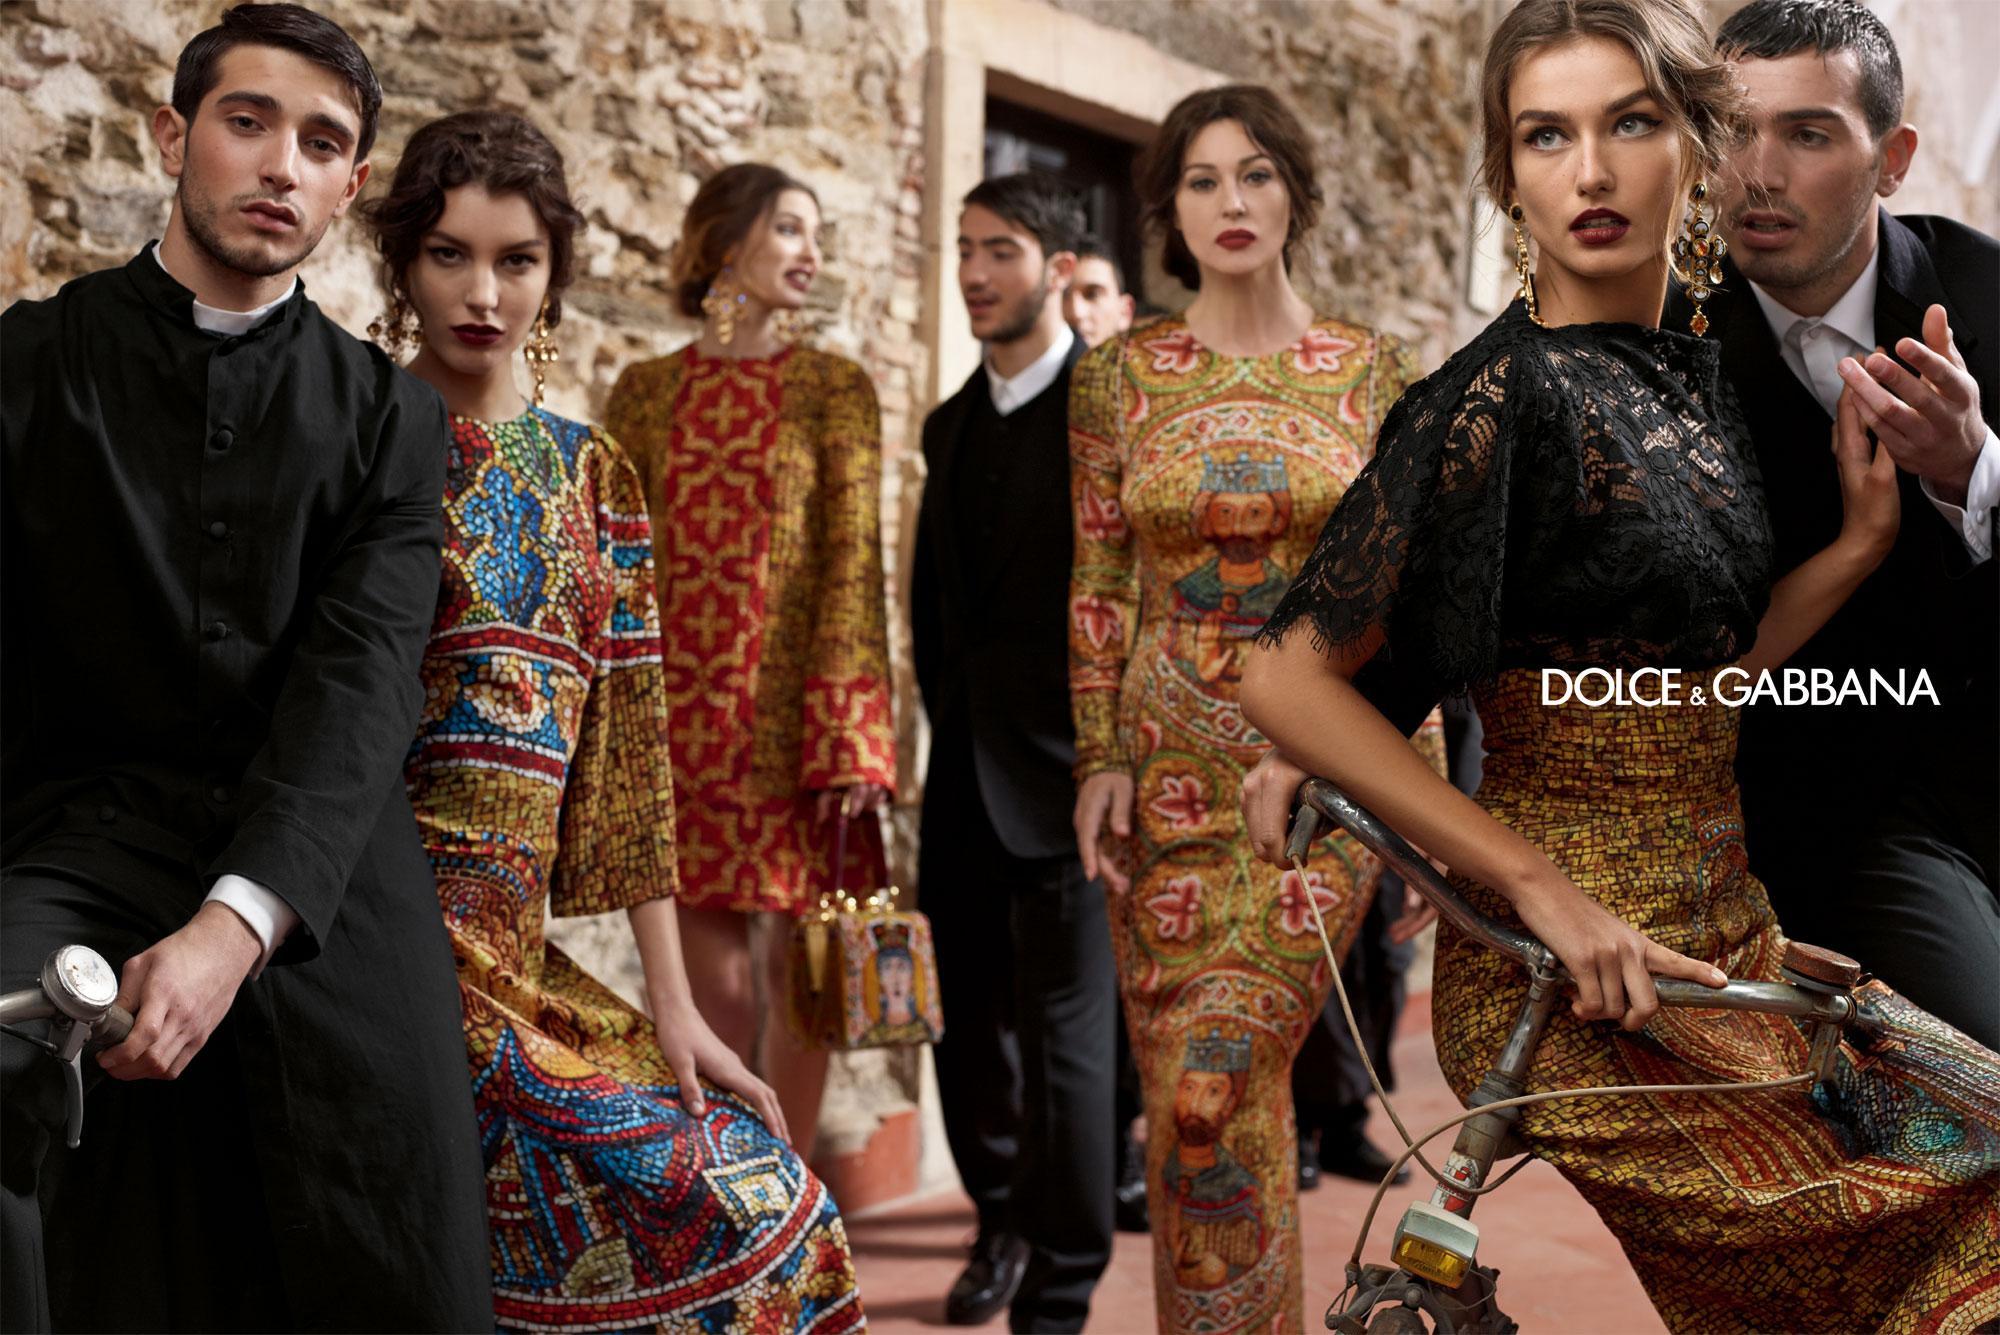 dolce-and-gabbana-fw-2014-women-adv-campaign-8